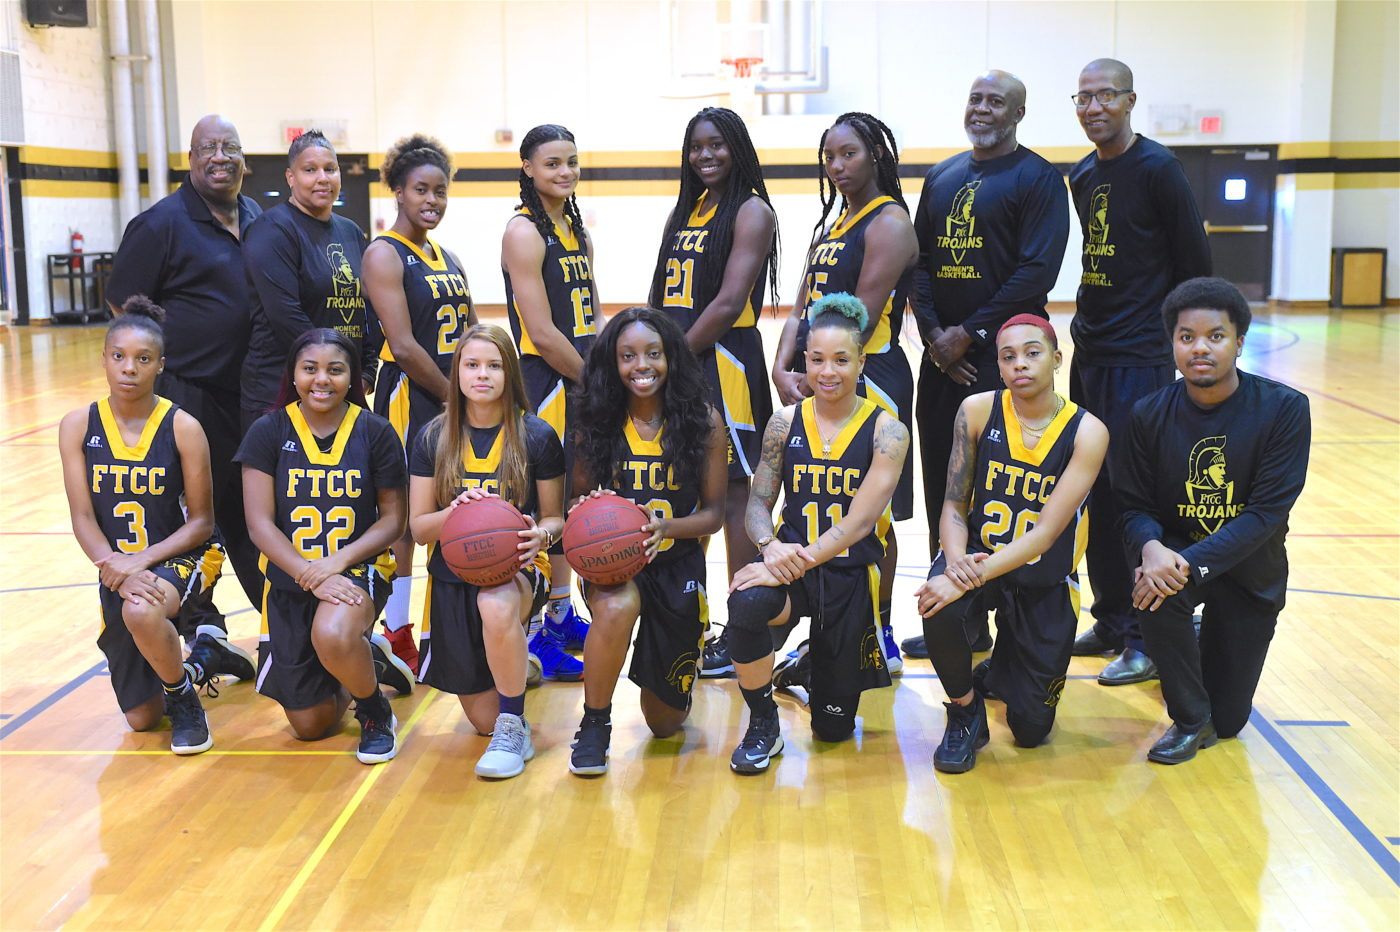 Womensbasketballteam